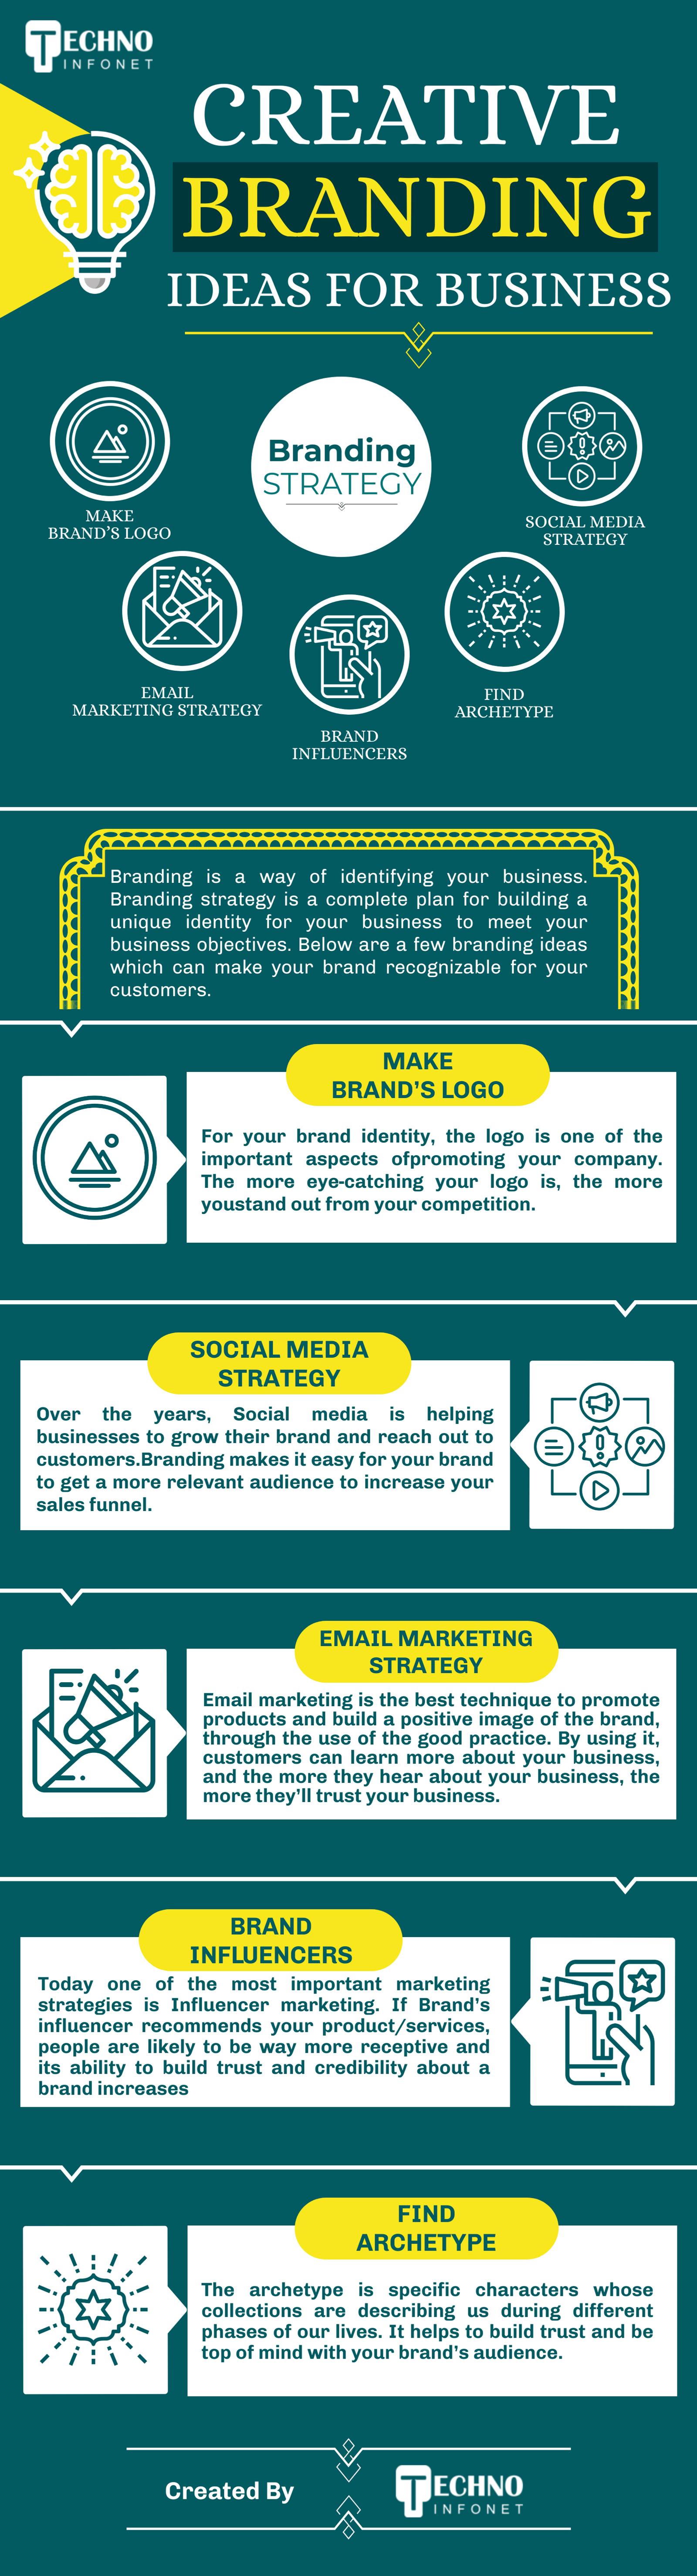 Creative branding ideas for business